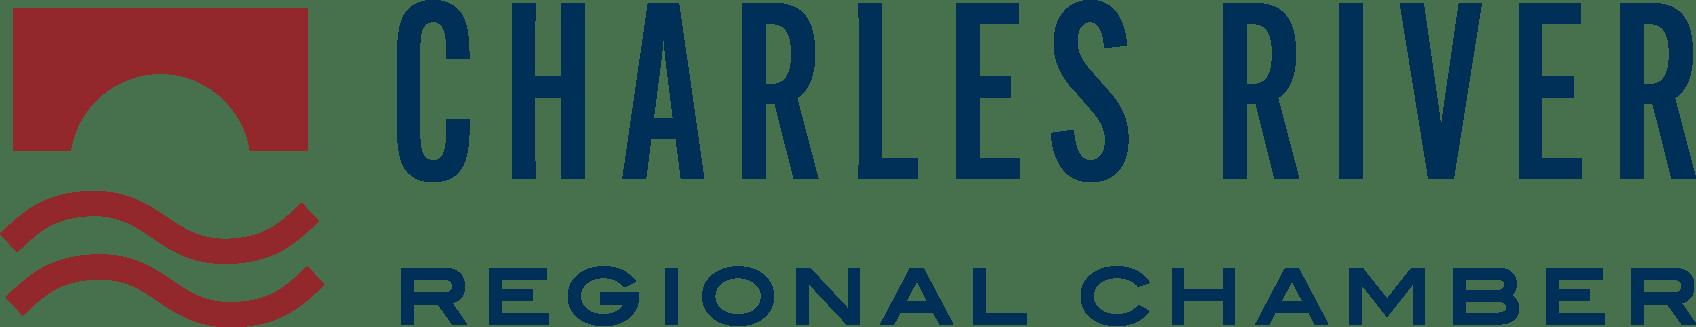 Charles River Regional Chamber Logo